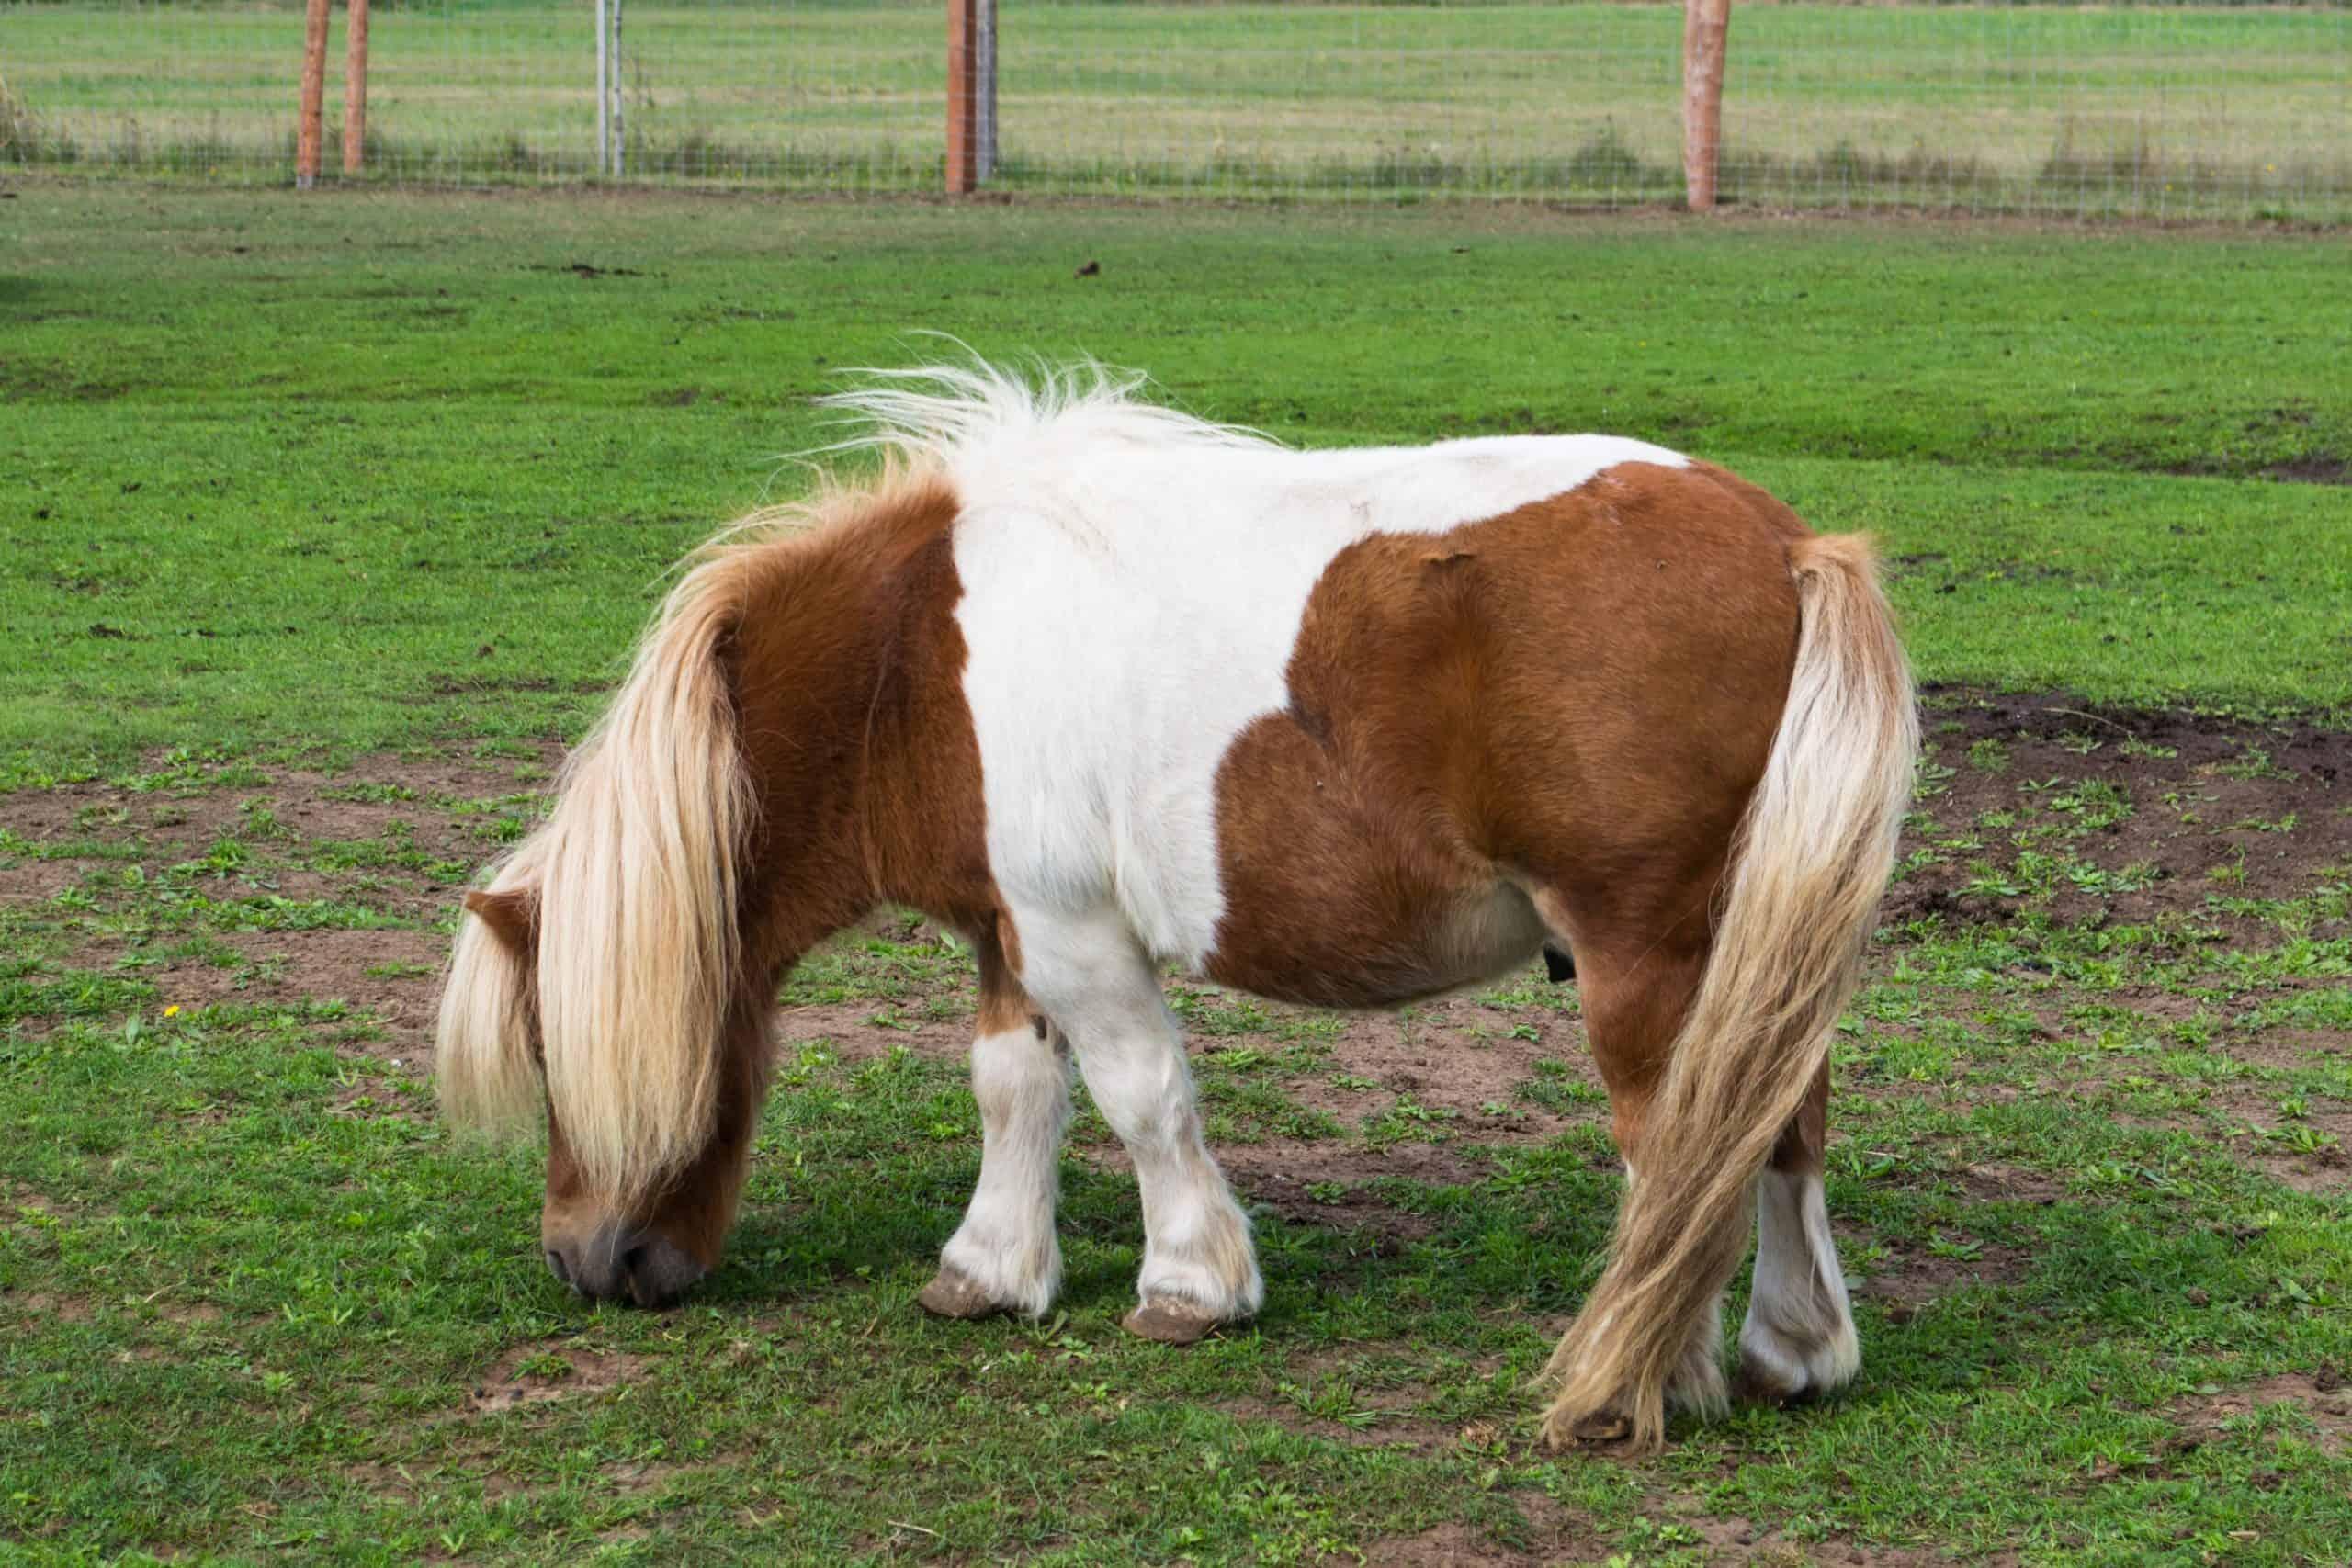 Shetland pony - race horses belonging to pony